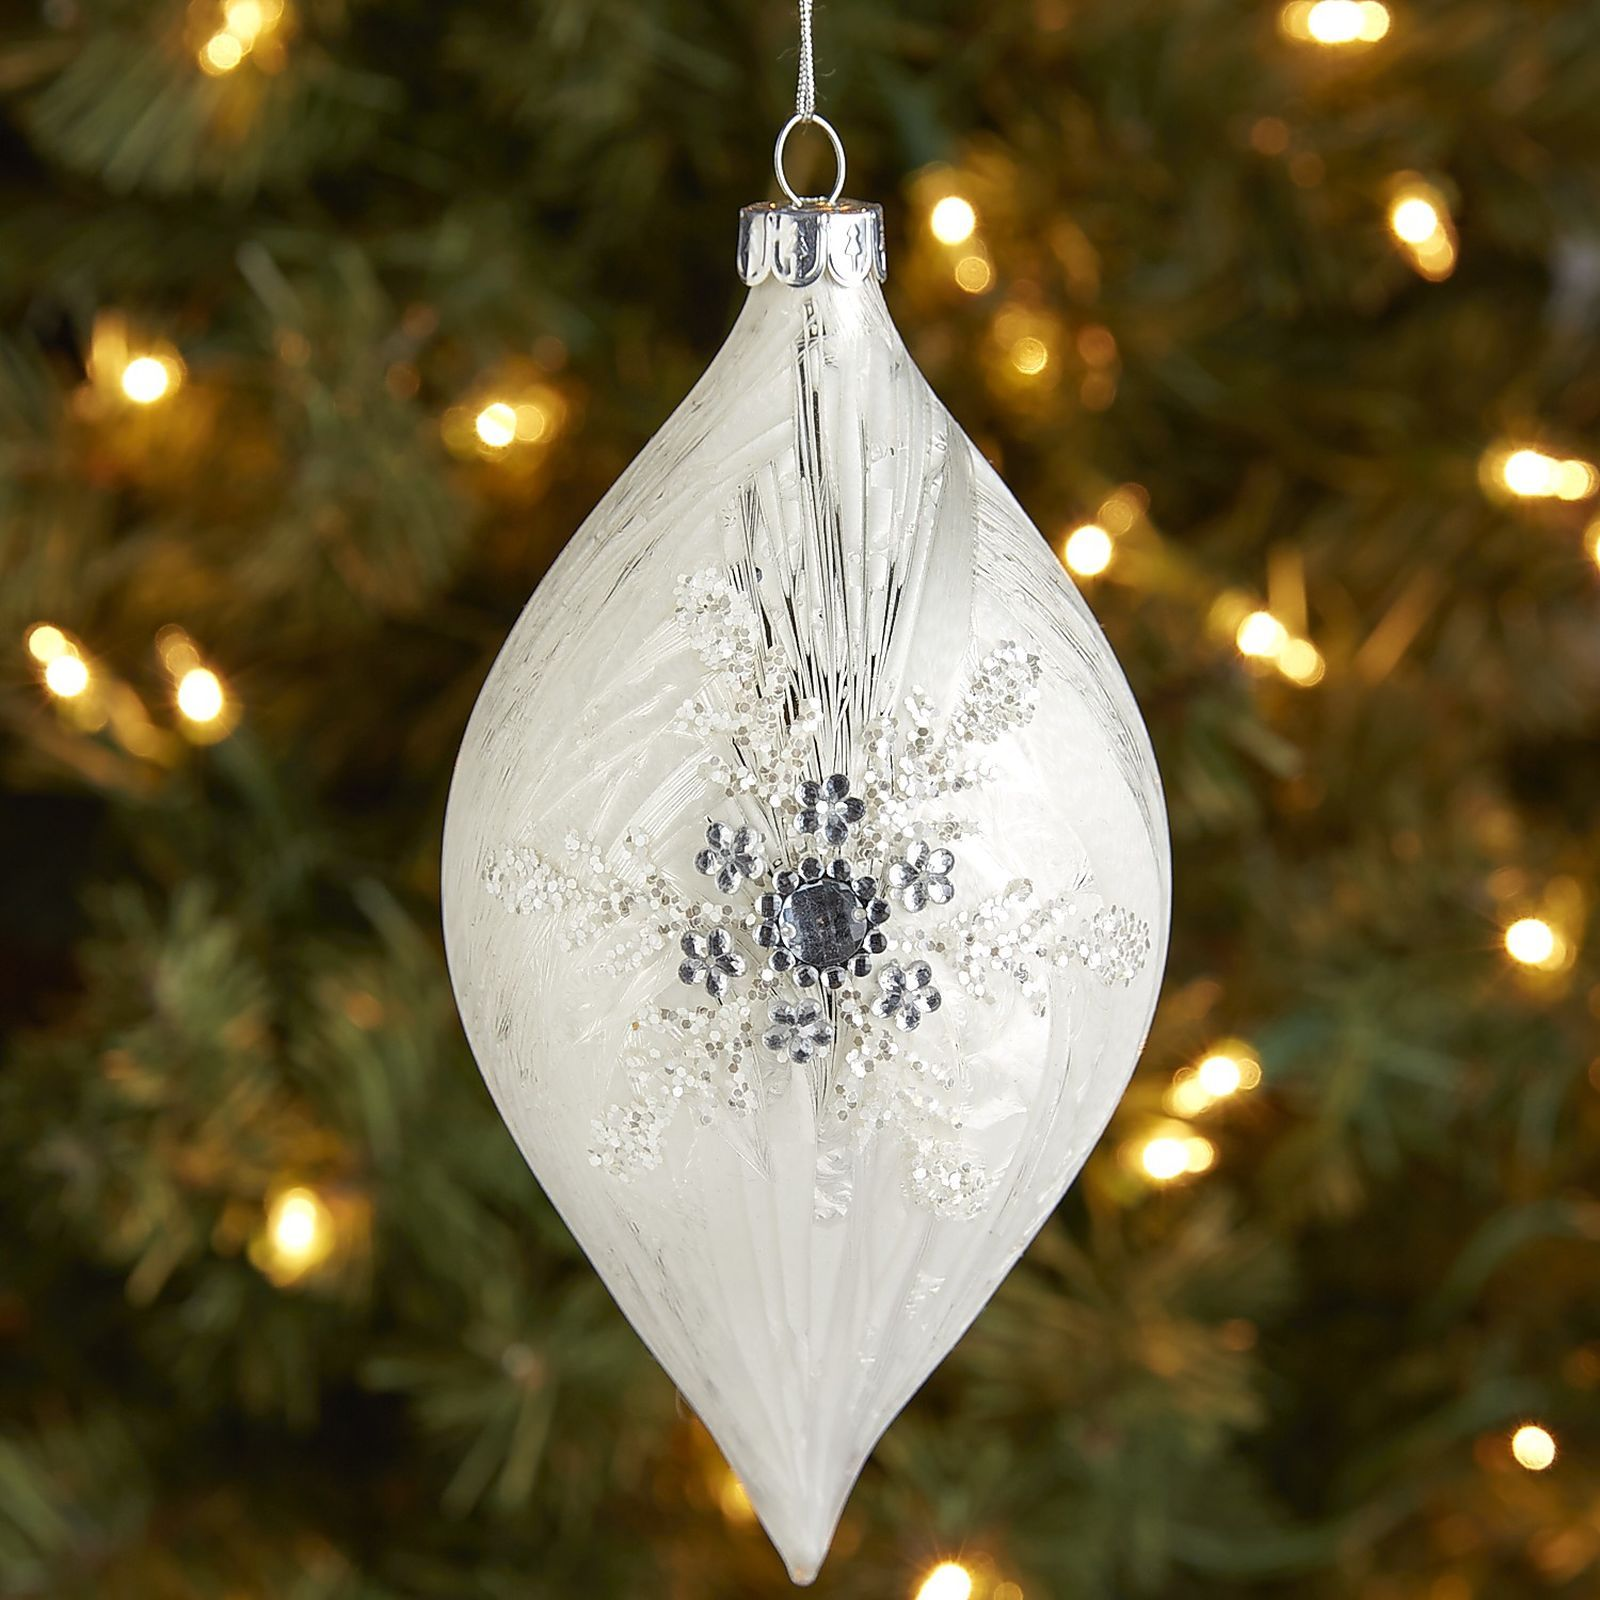 Ice Snowflake Glass Drop Ornament  Pier 1 Imports  Christmas Ornaments   Pinterest  Ornament, Christmas Ornament And White Christmas Ornaments